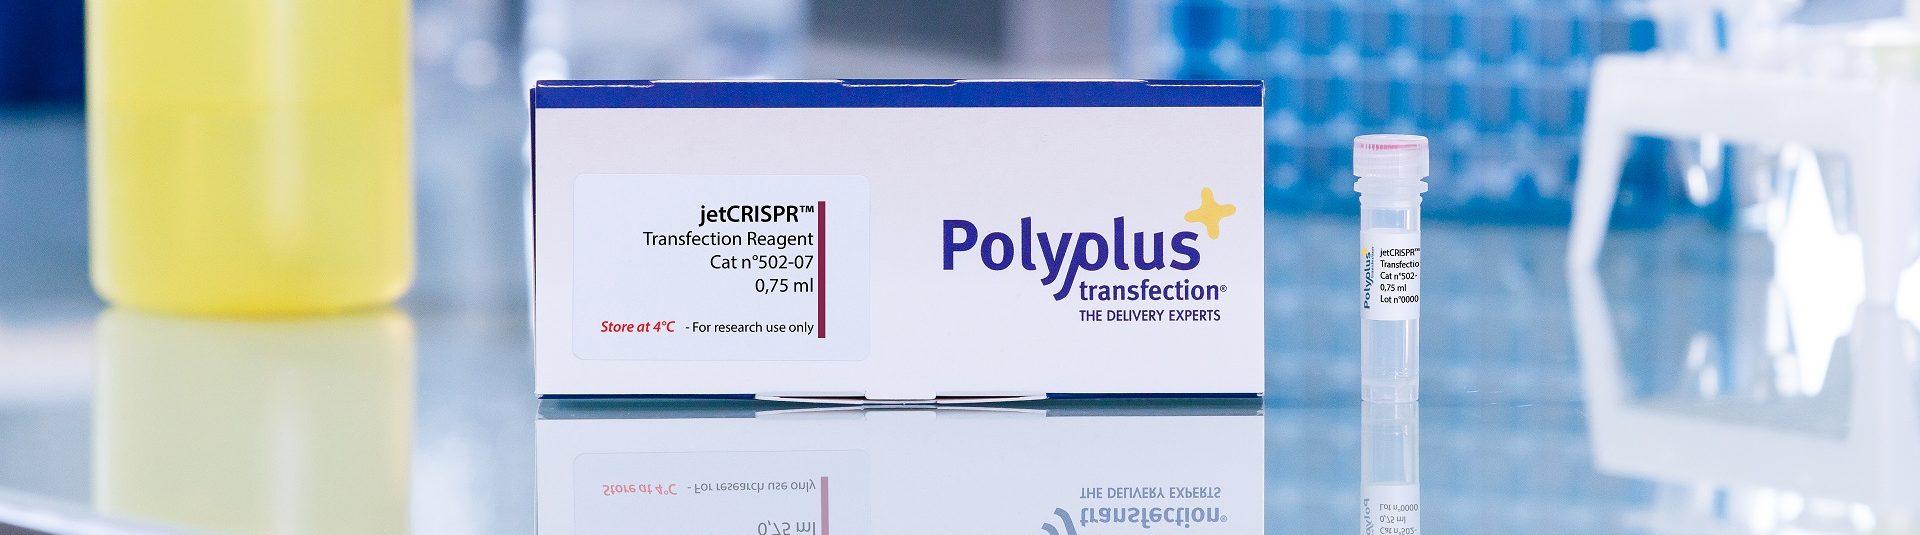 jetCRISPR packaging - Polyplus-transfection